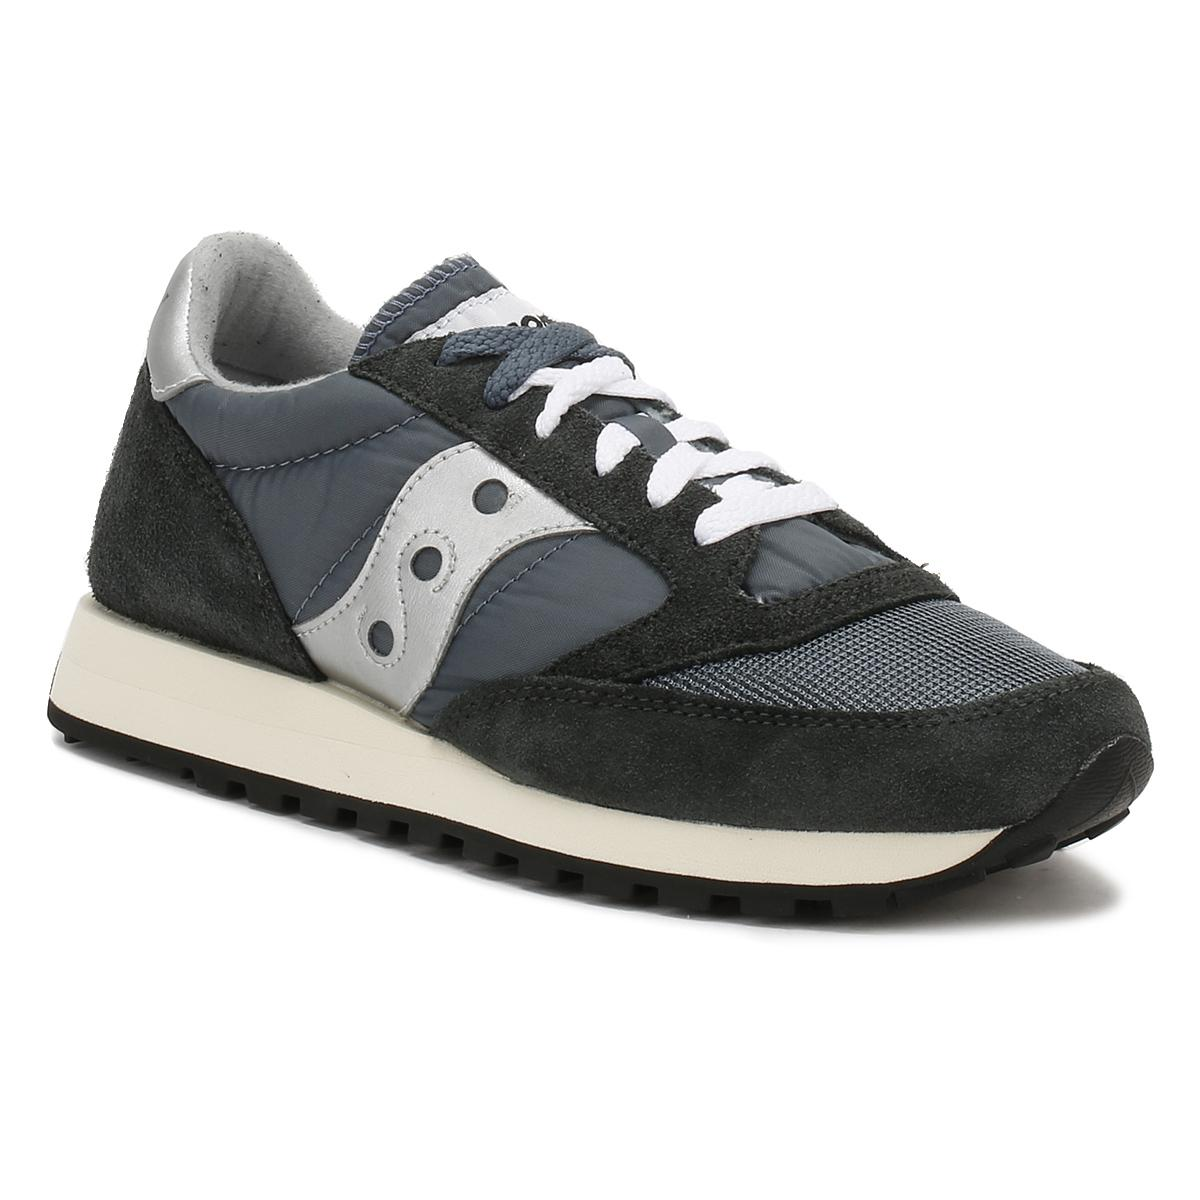 newest a3fe0 59326 Men's Blue Navy Jazz Original Vintage Sneakers